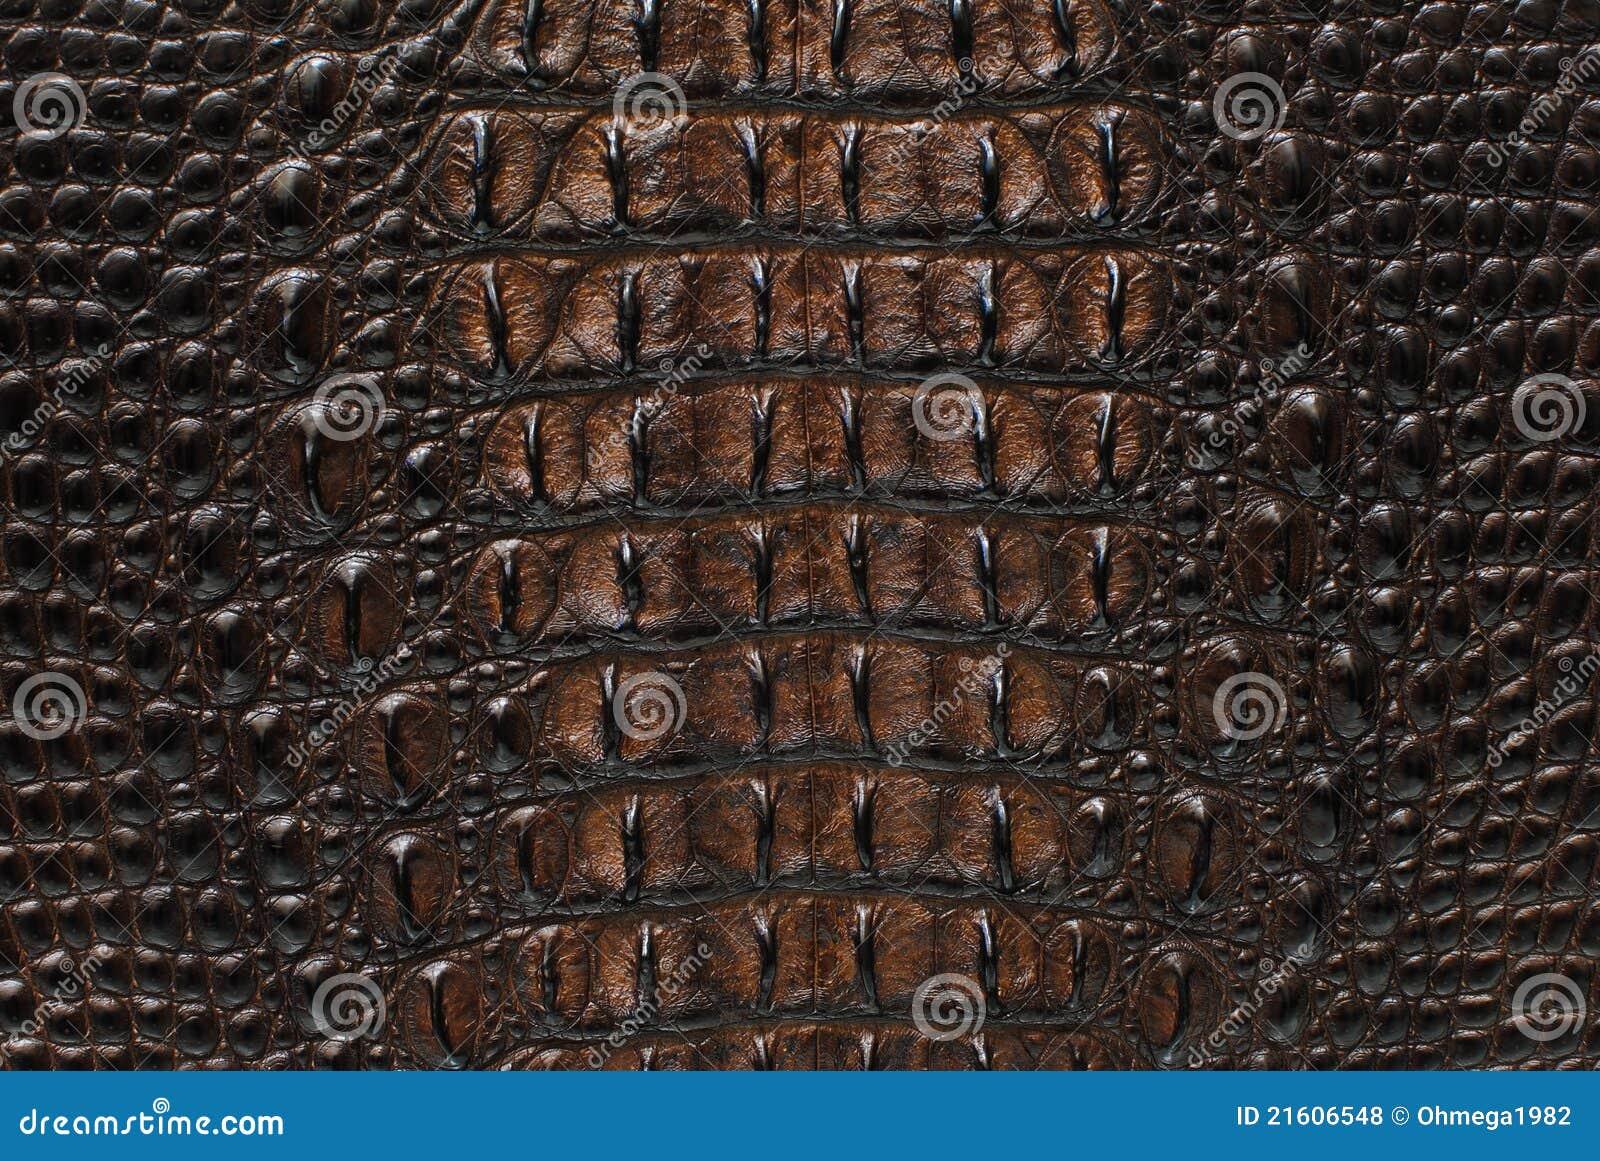 Freshwater Crocodile Bone Skin Texture Background Stock